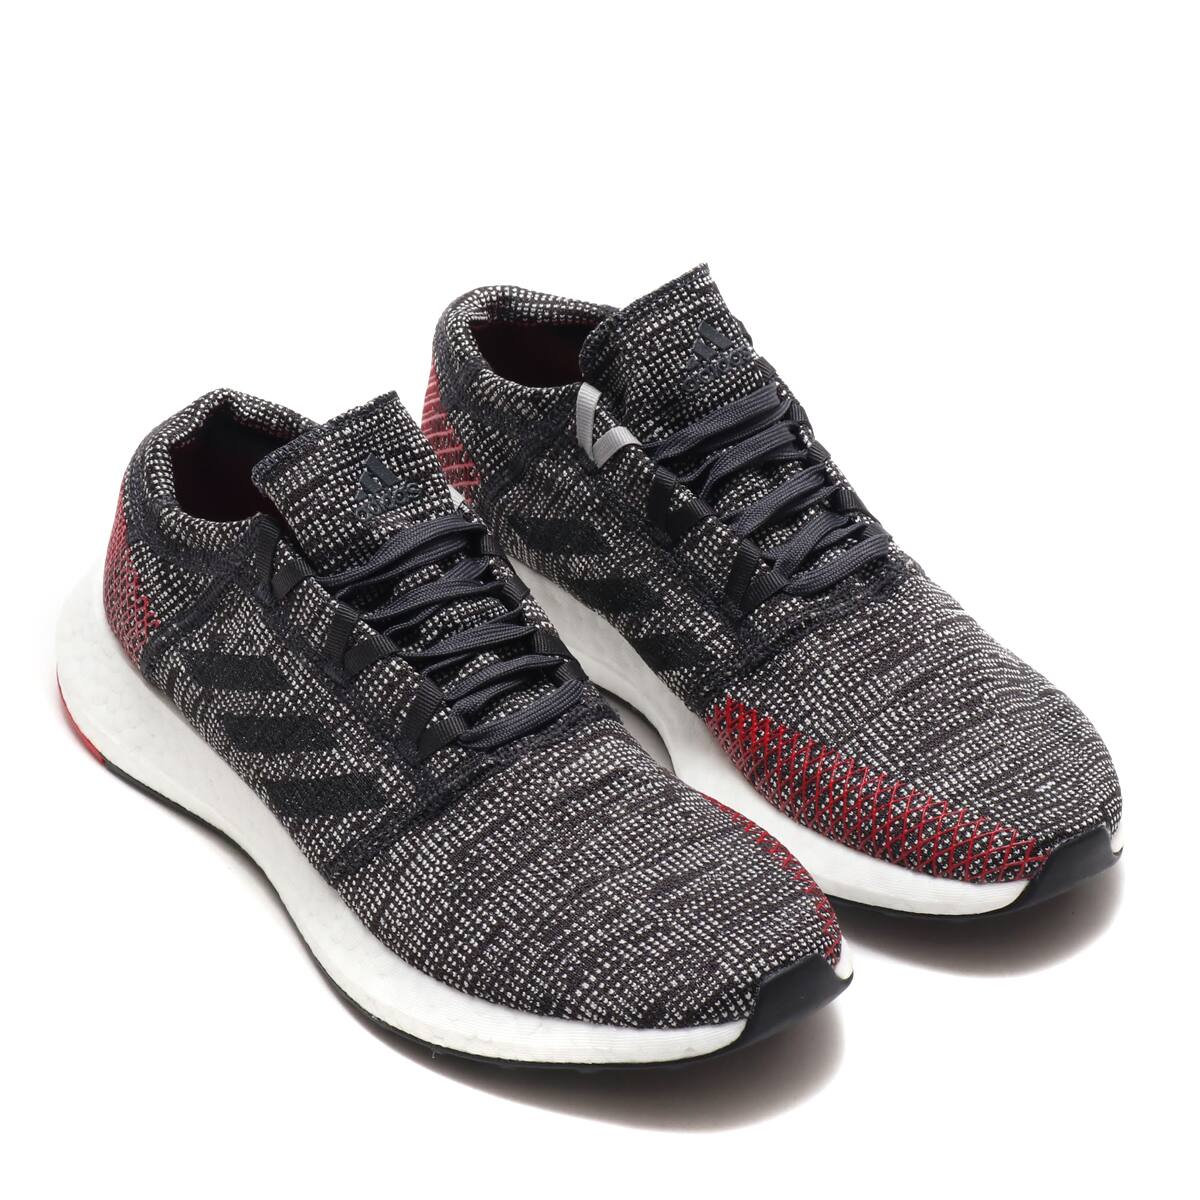 adidas PureBOOST GO CARBON/CORE BLACK